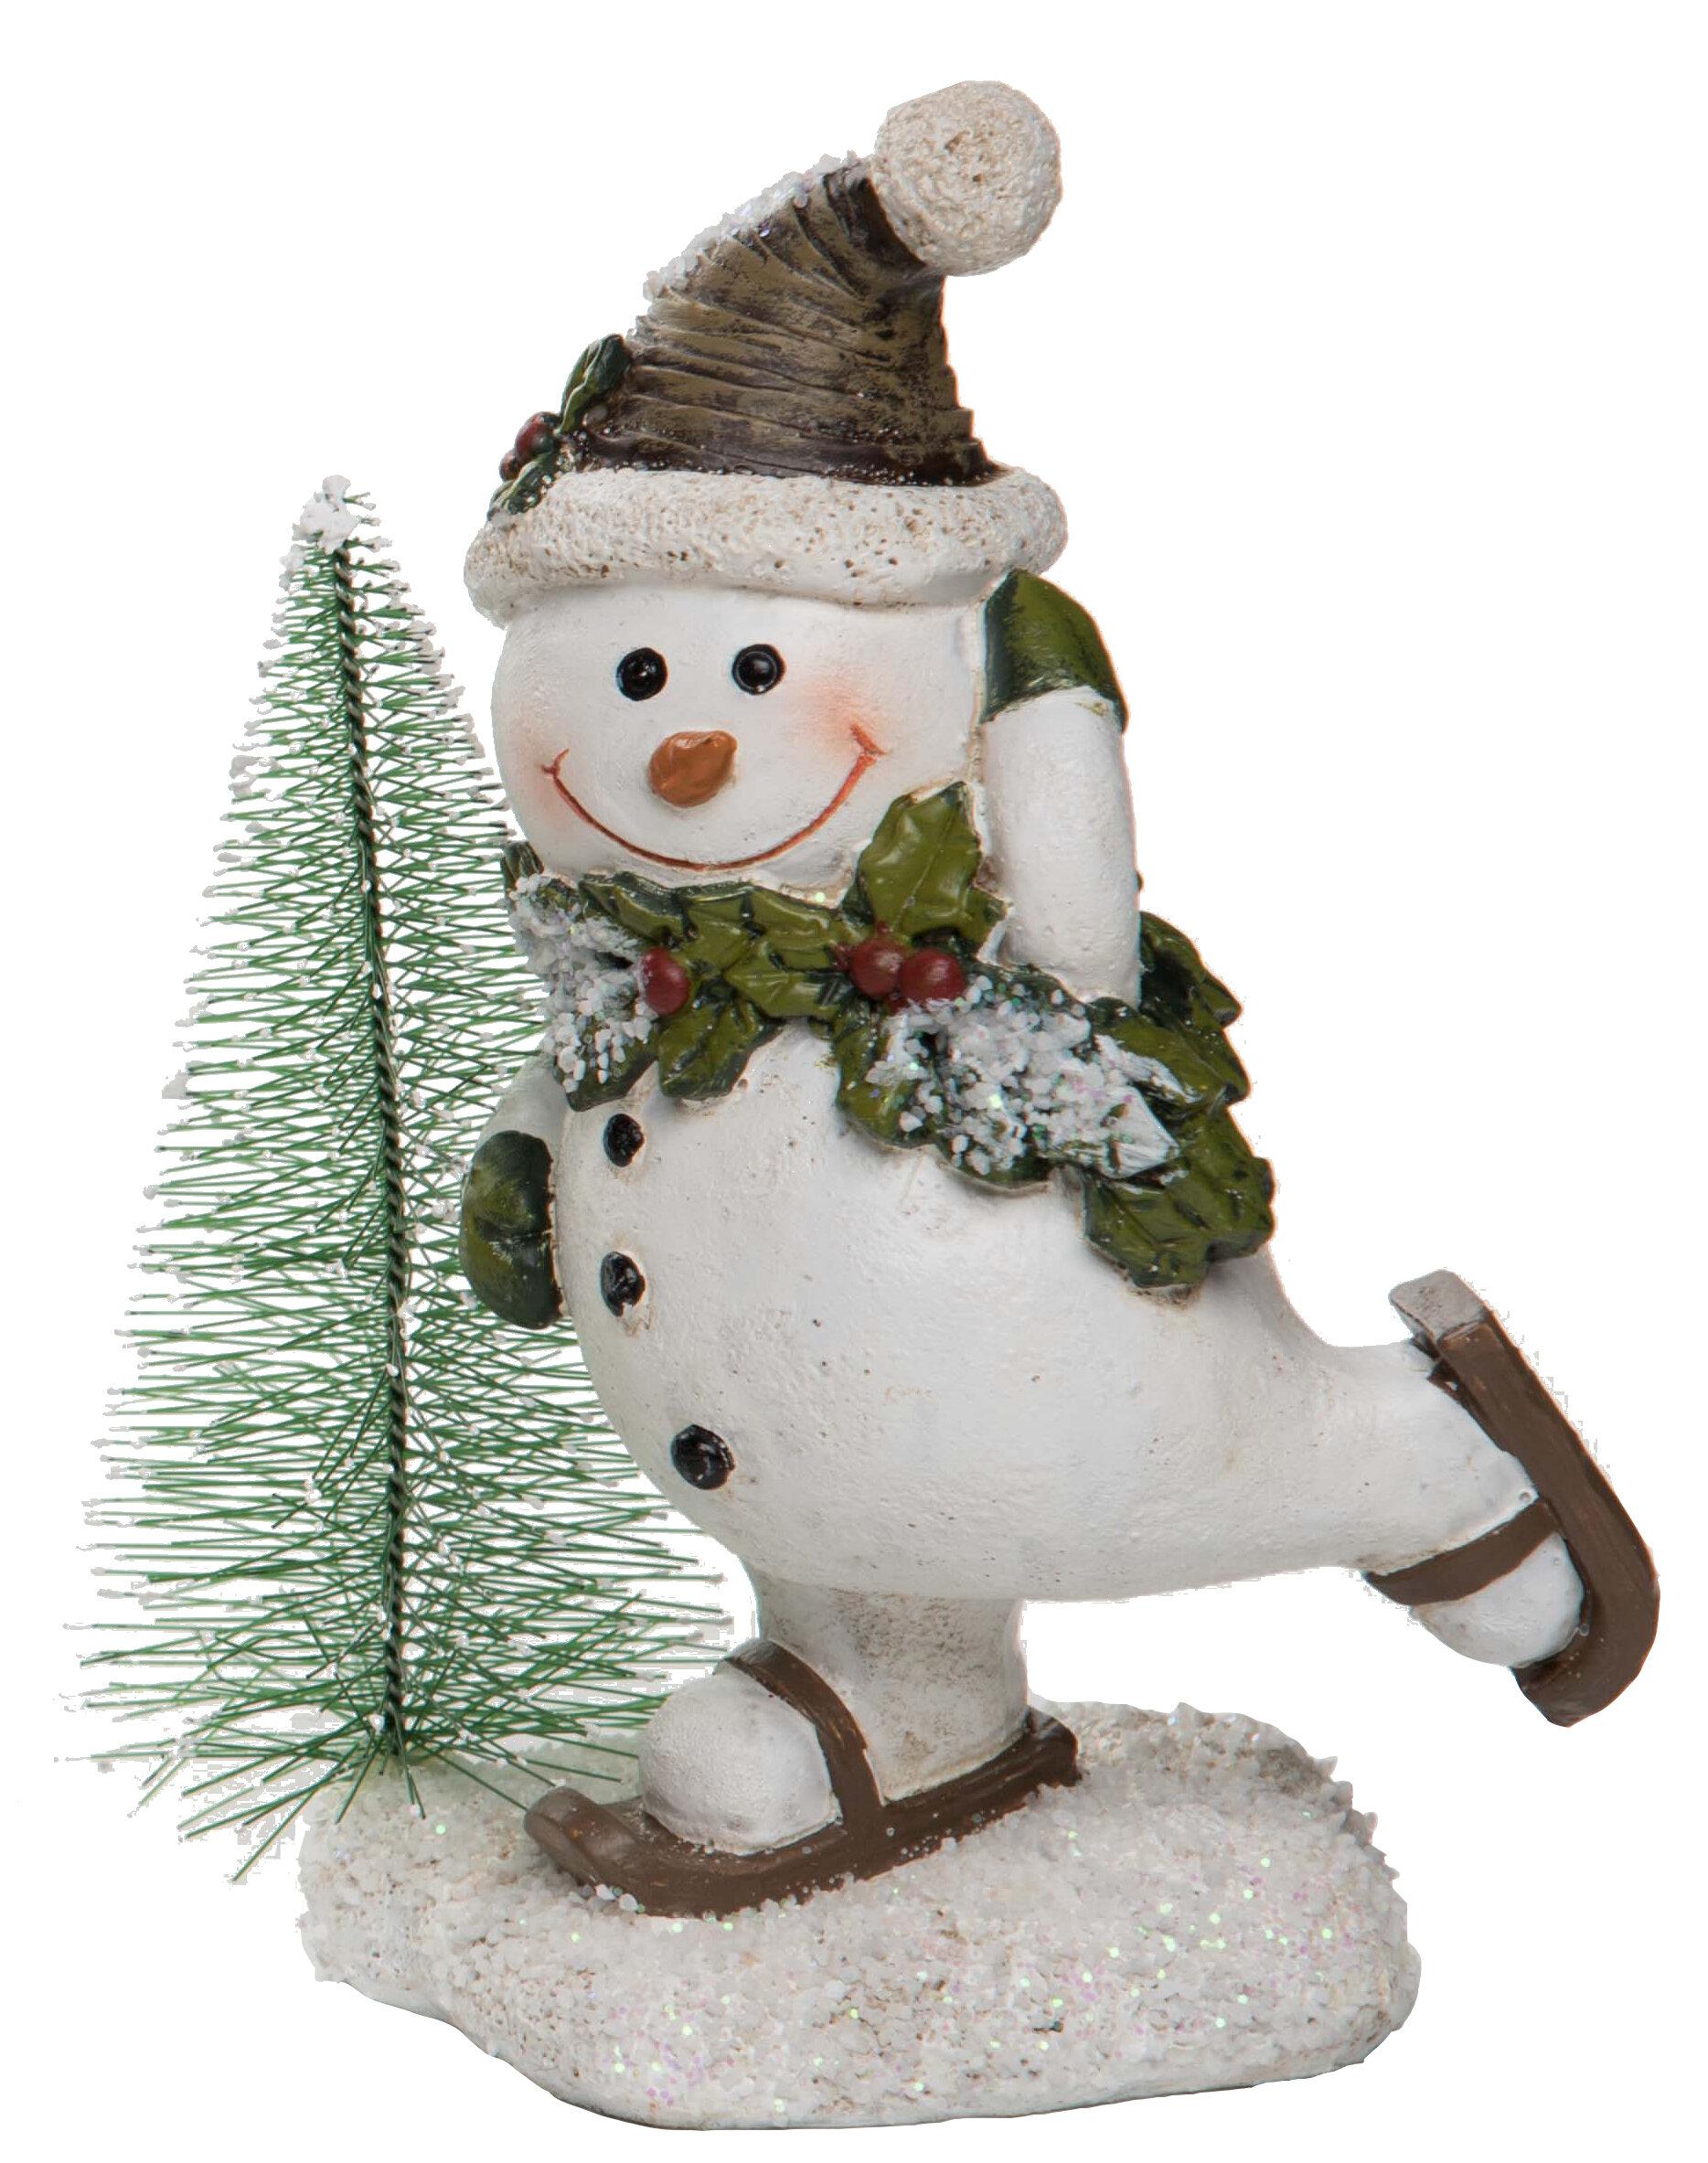 The Holiday Aisle Small Resin Snowman Figurine Reviews Wayfair